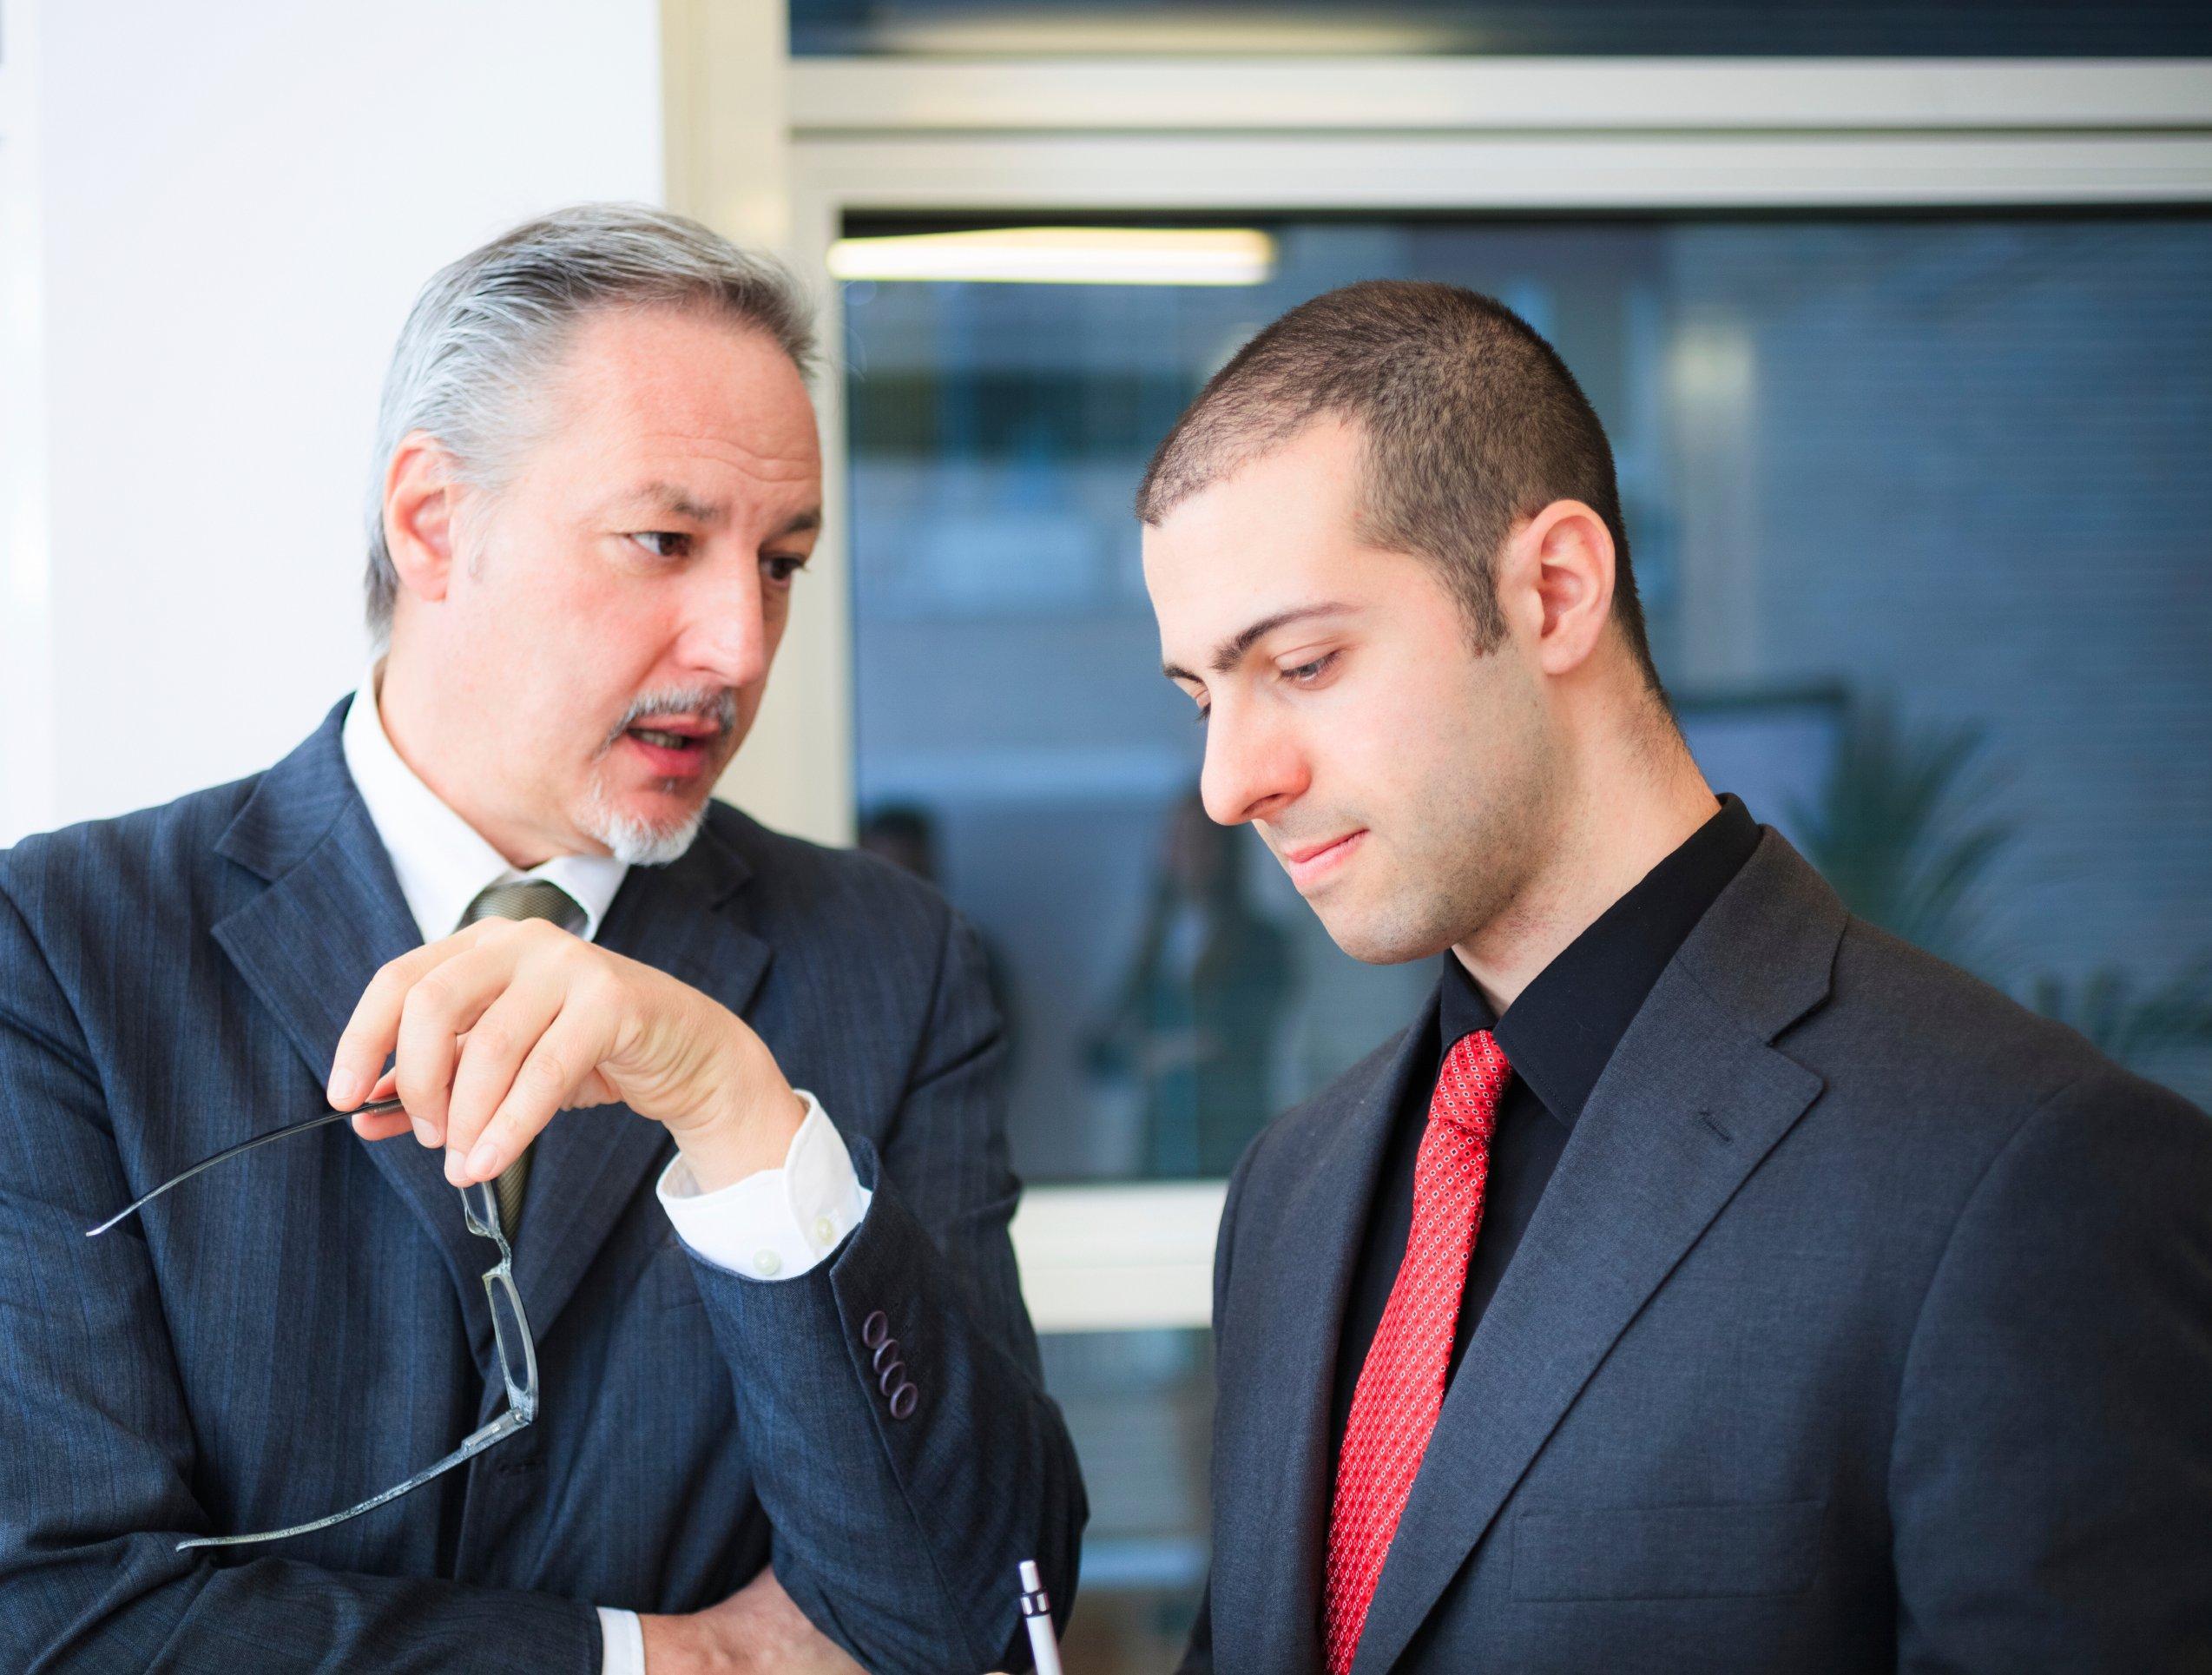 manager giving employee feedback